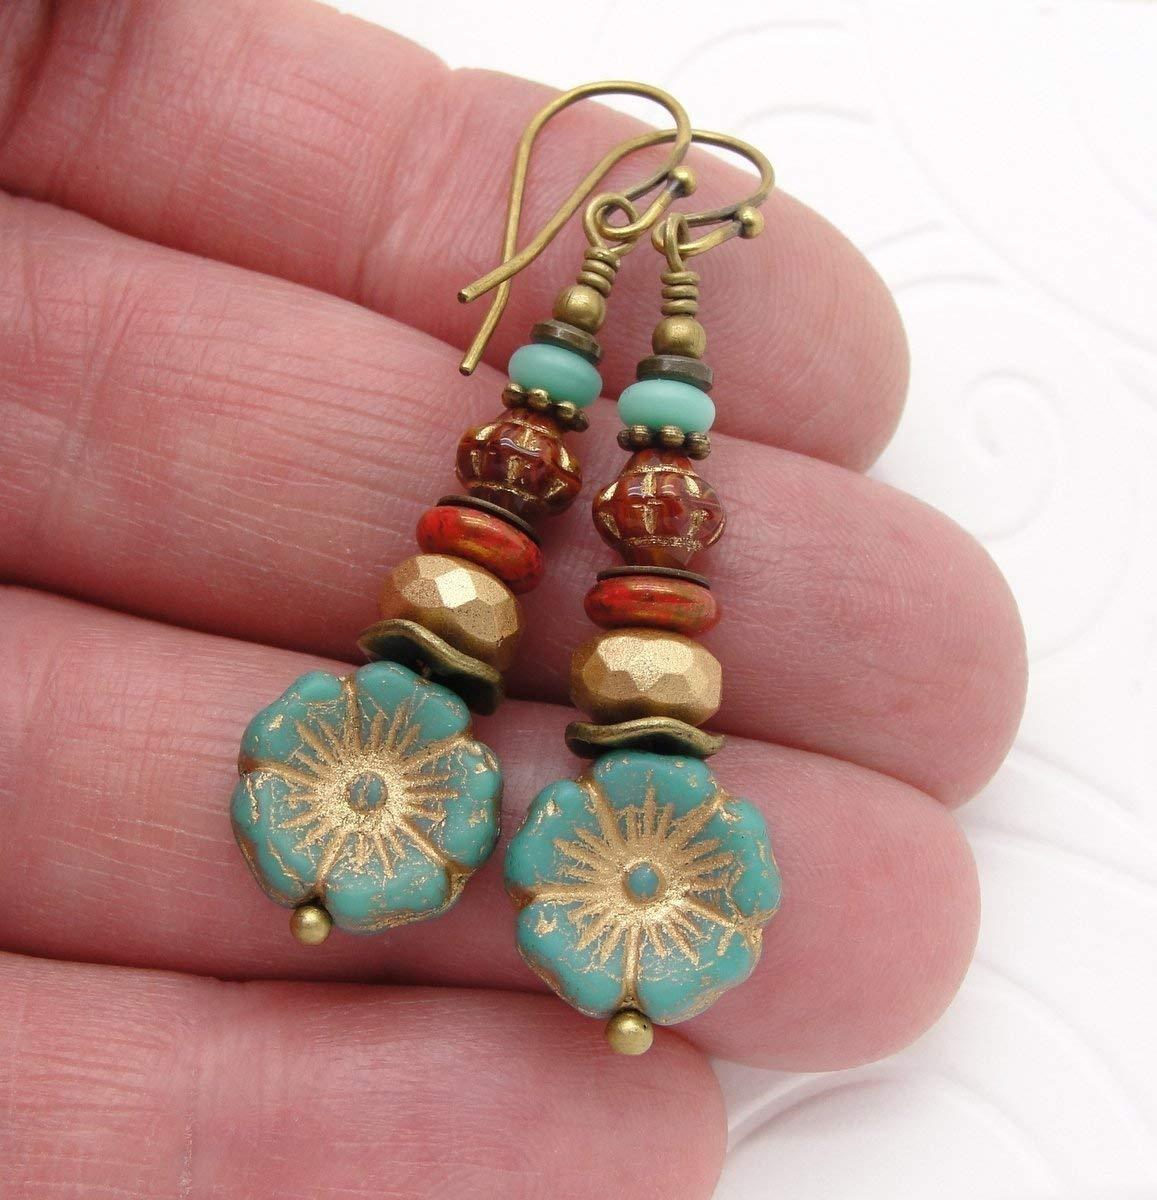 Southwestern Earrings with Flowers in Red n Blue